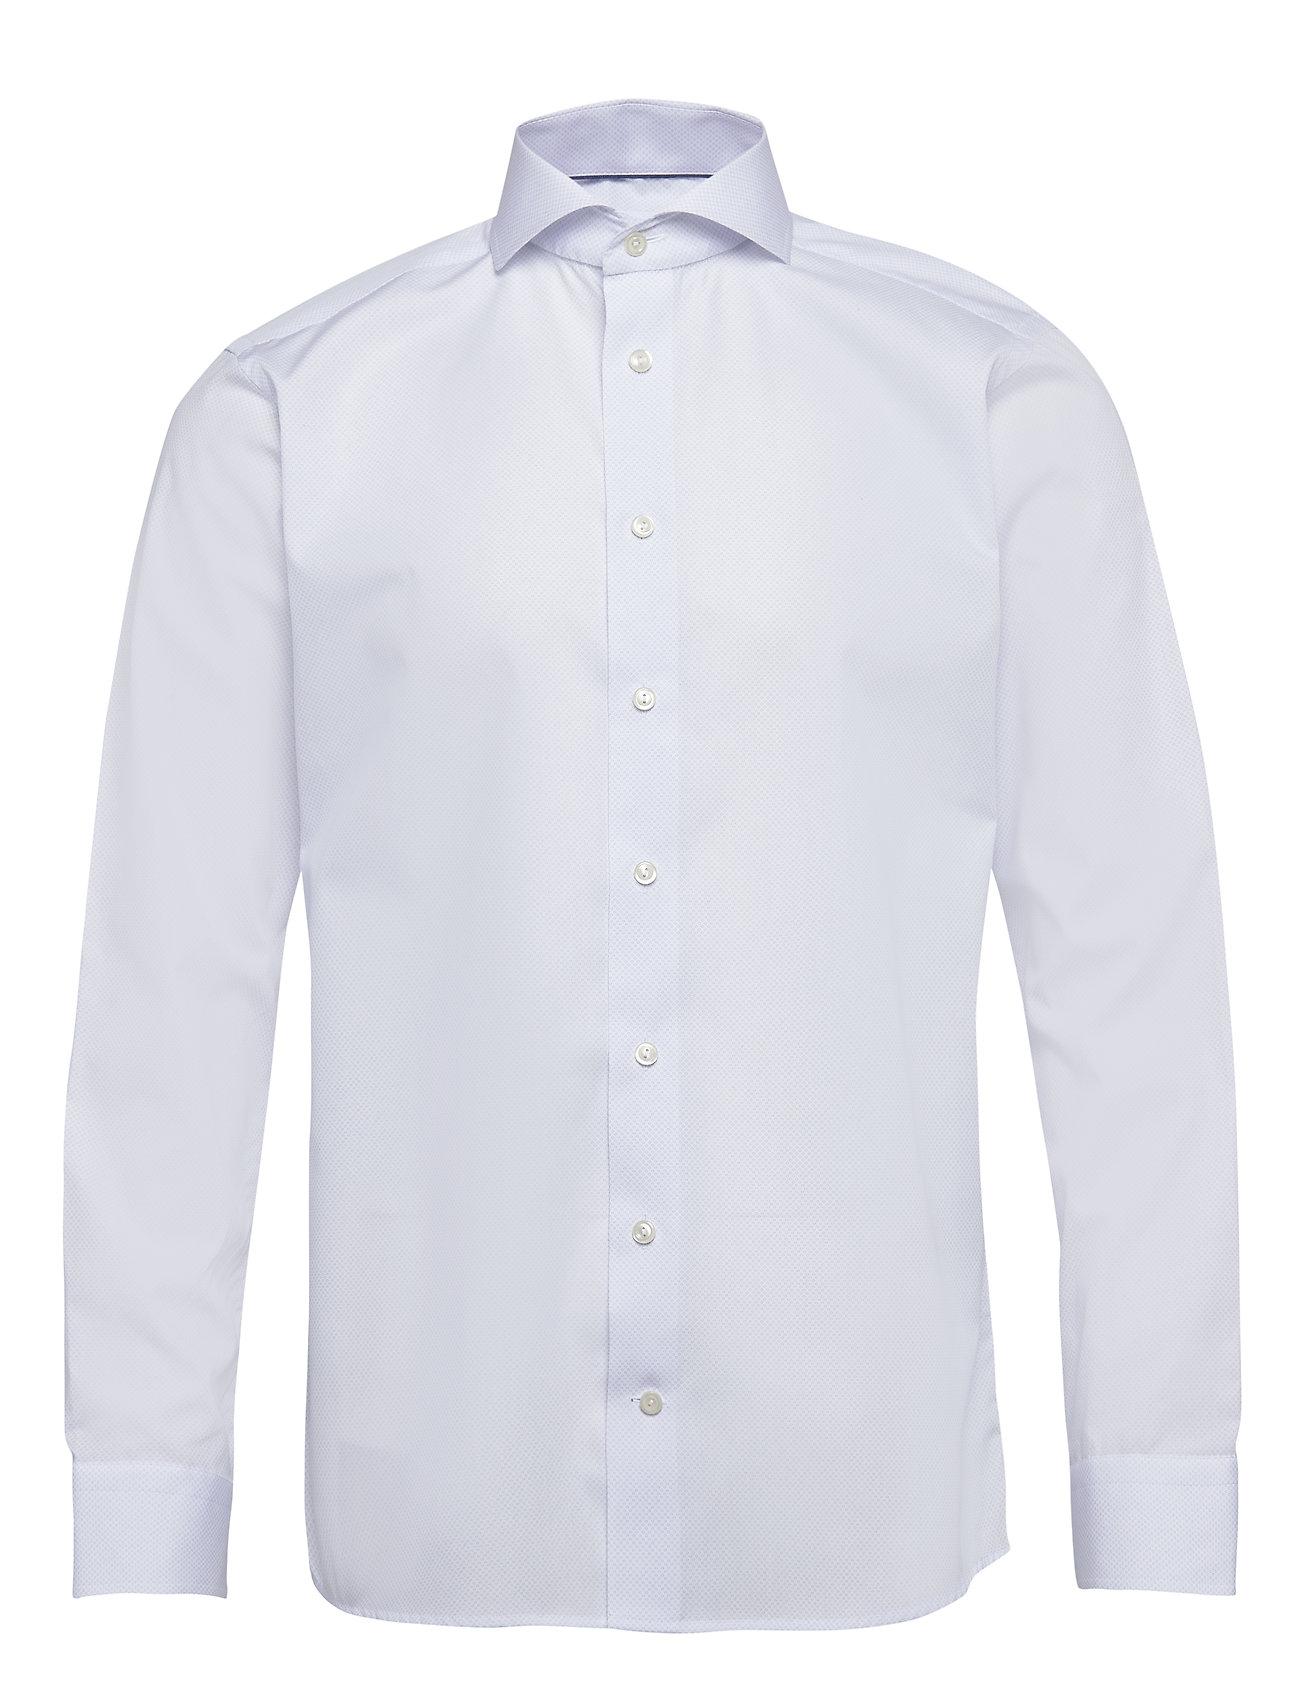 Eton Blue Twill Shirt - BLUE